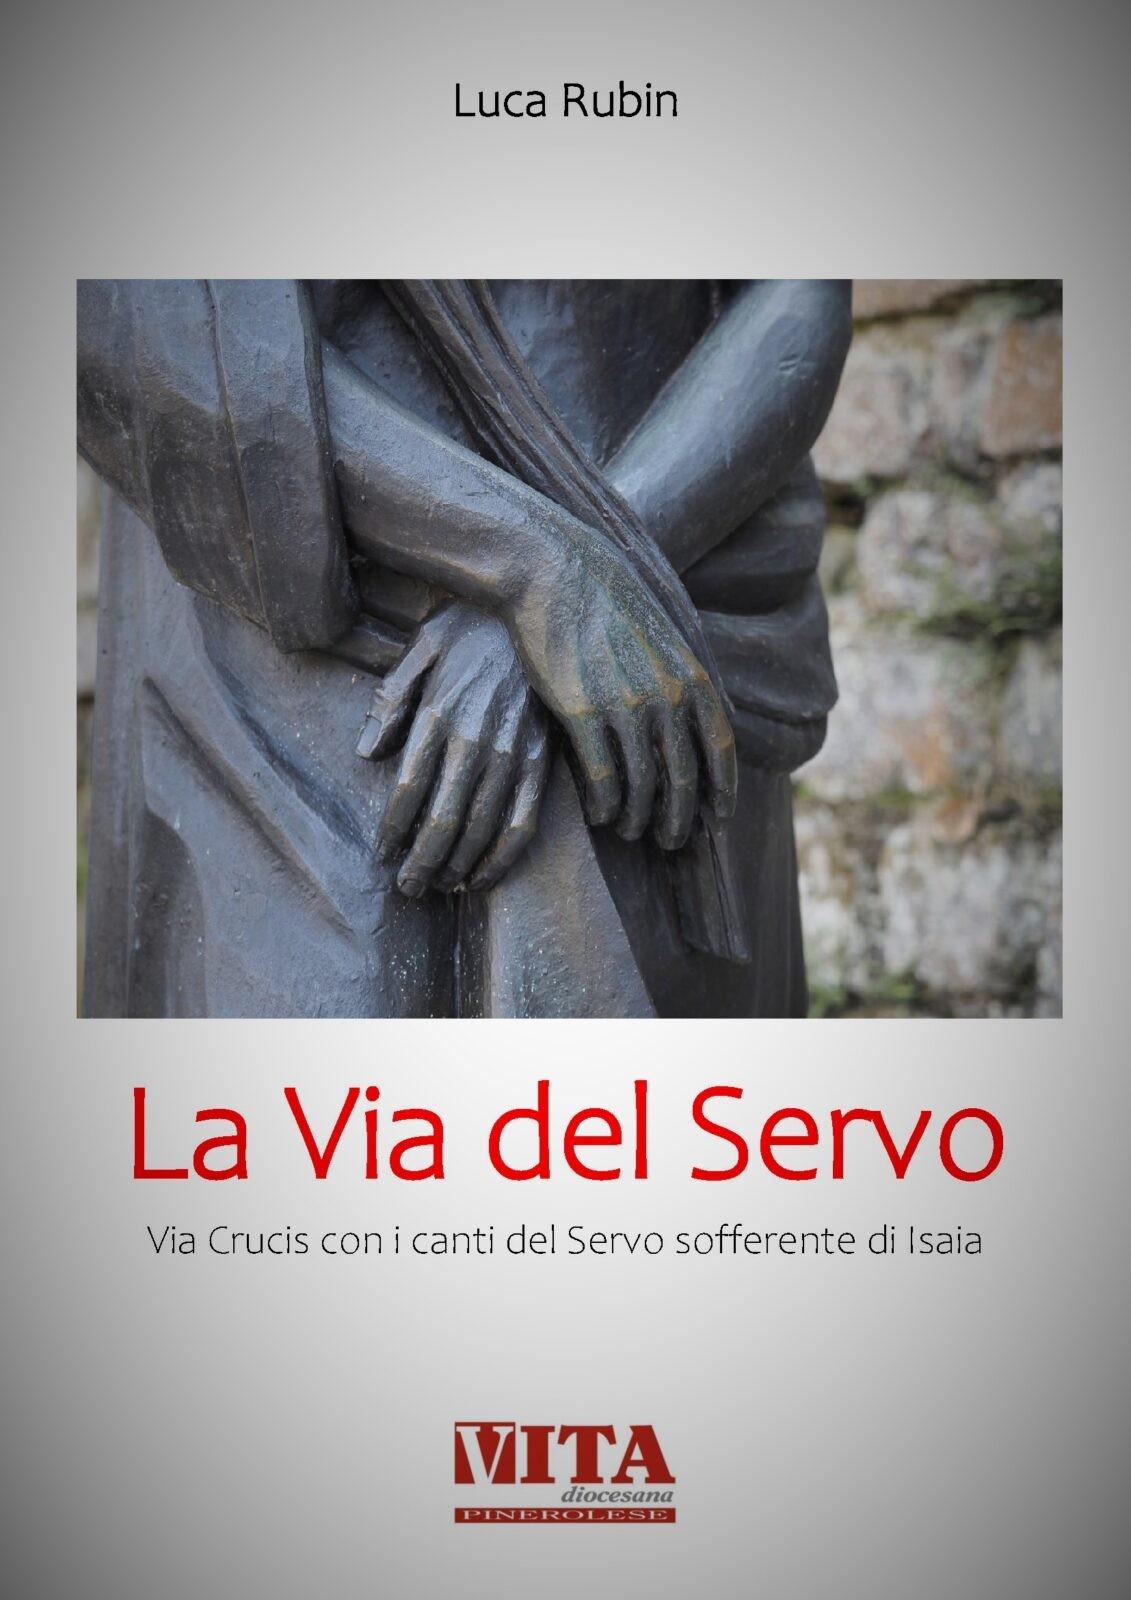 Via-Crucis-2020-La-Via-del-Servo_Pagina_01